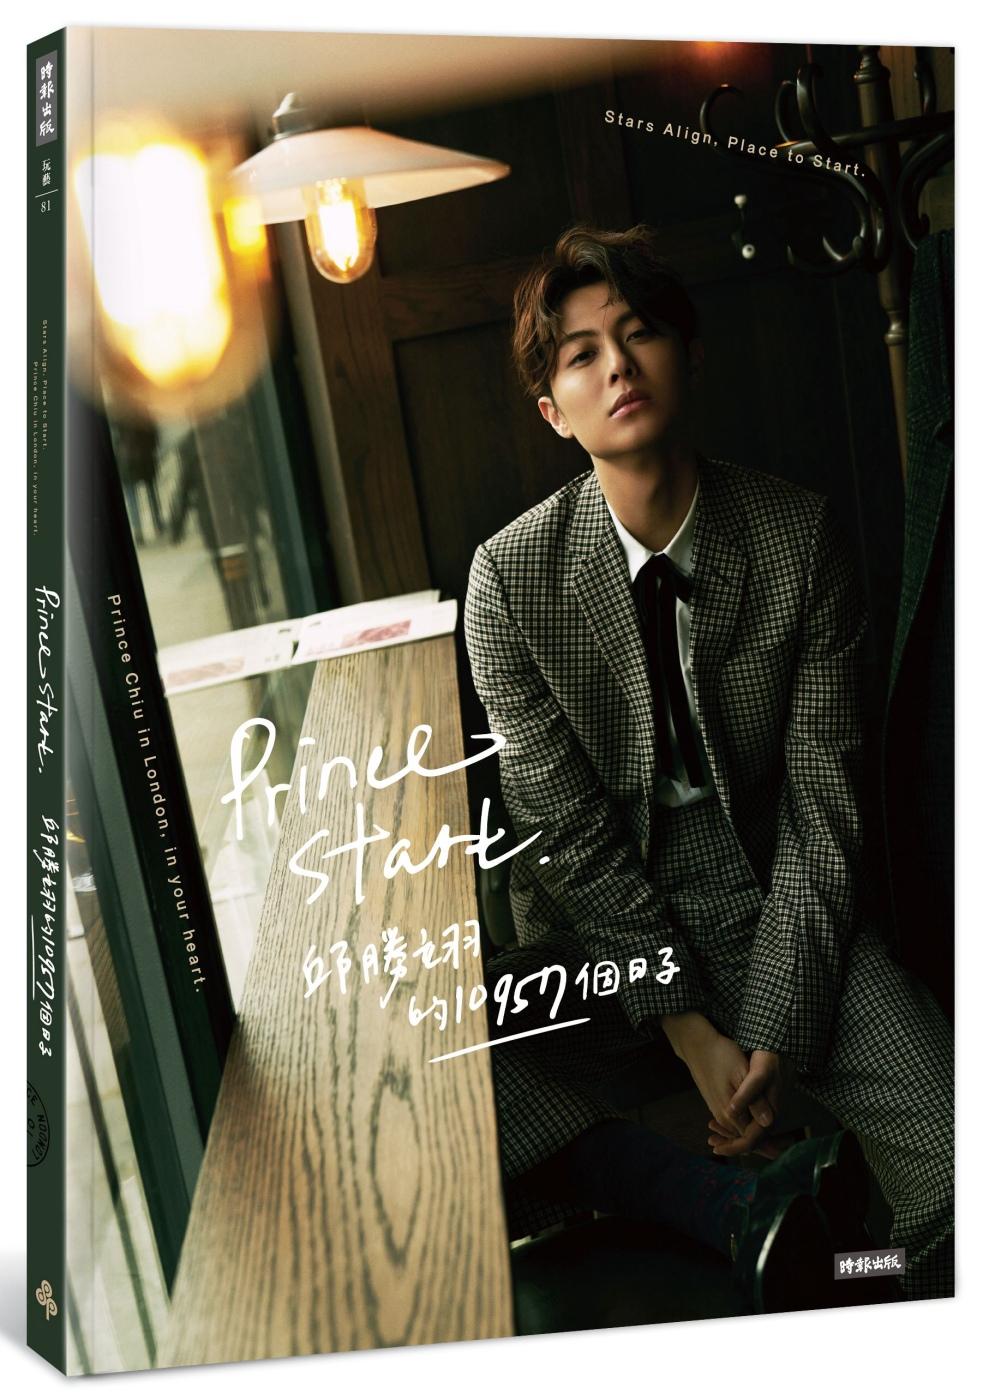 Prince Start:邱勝翊的10957個日子(博客來獨家限量海報版)